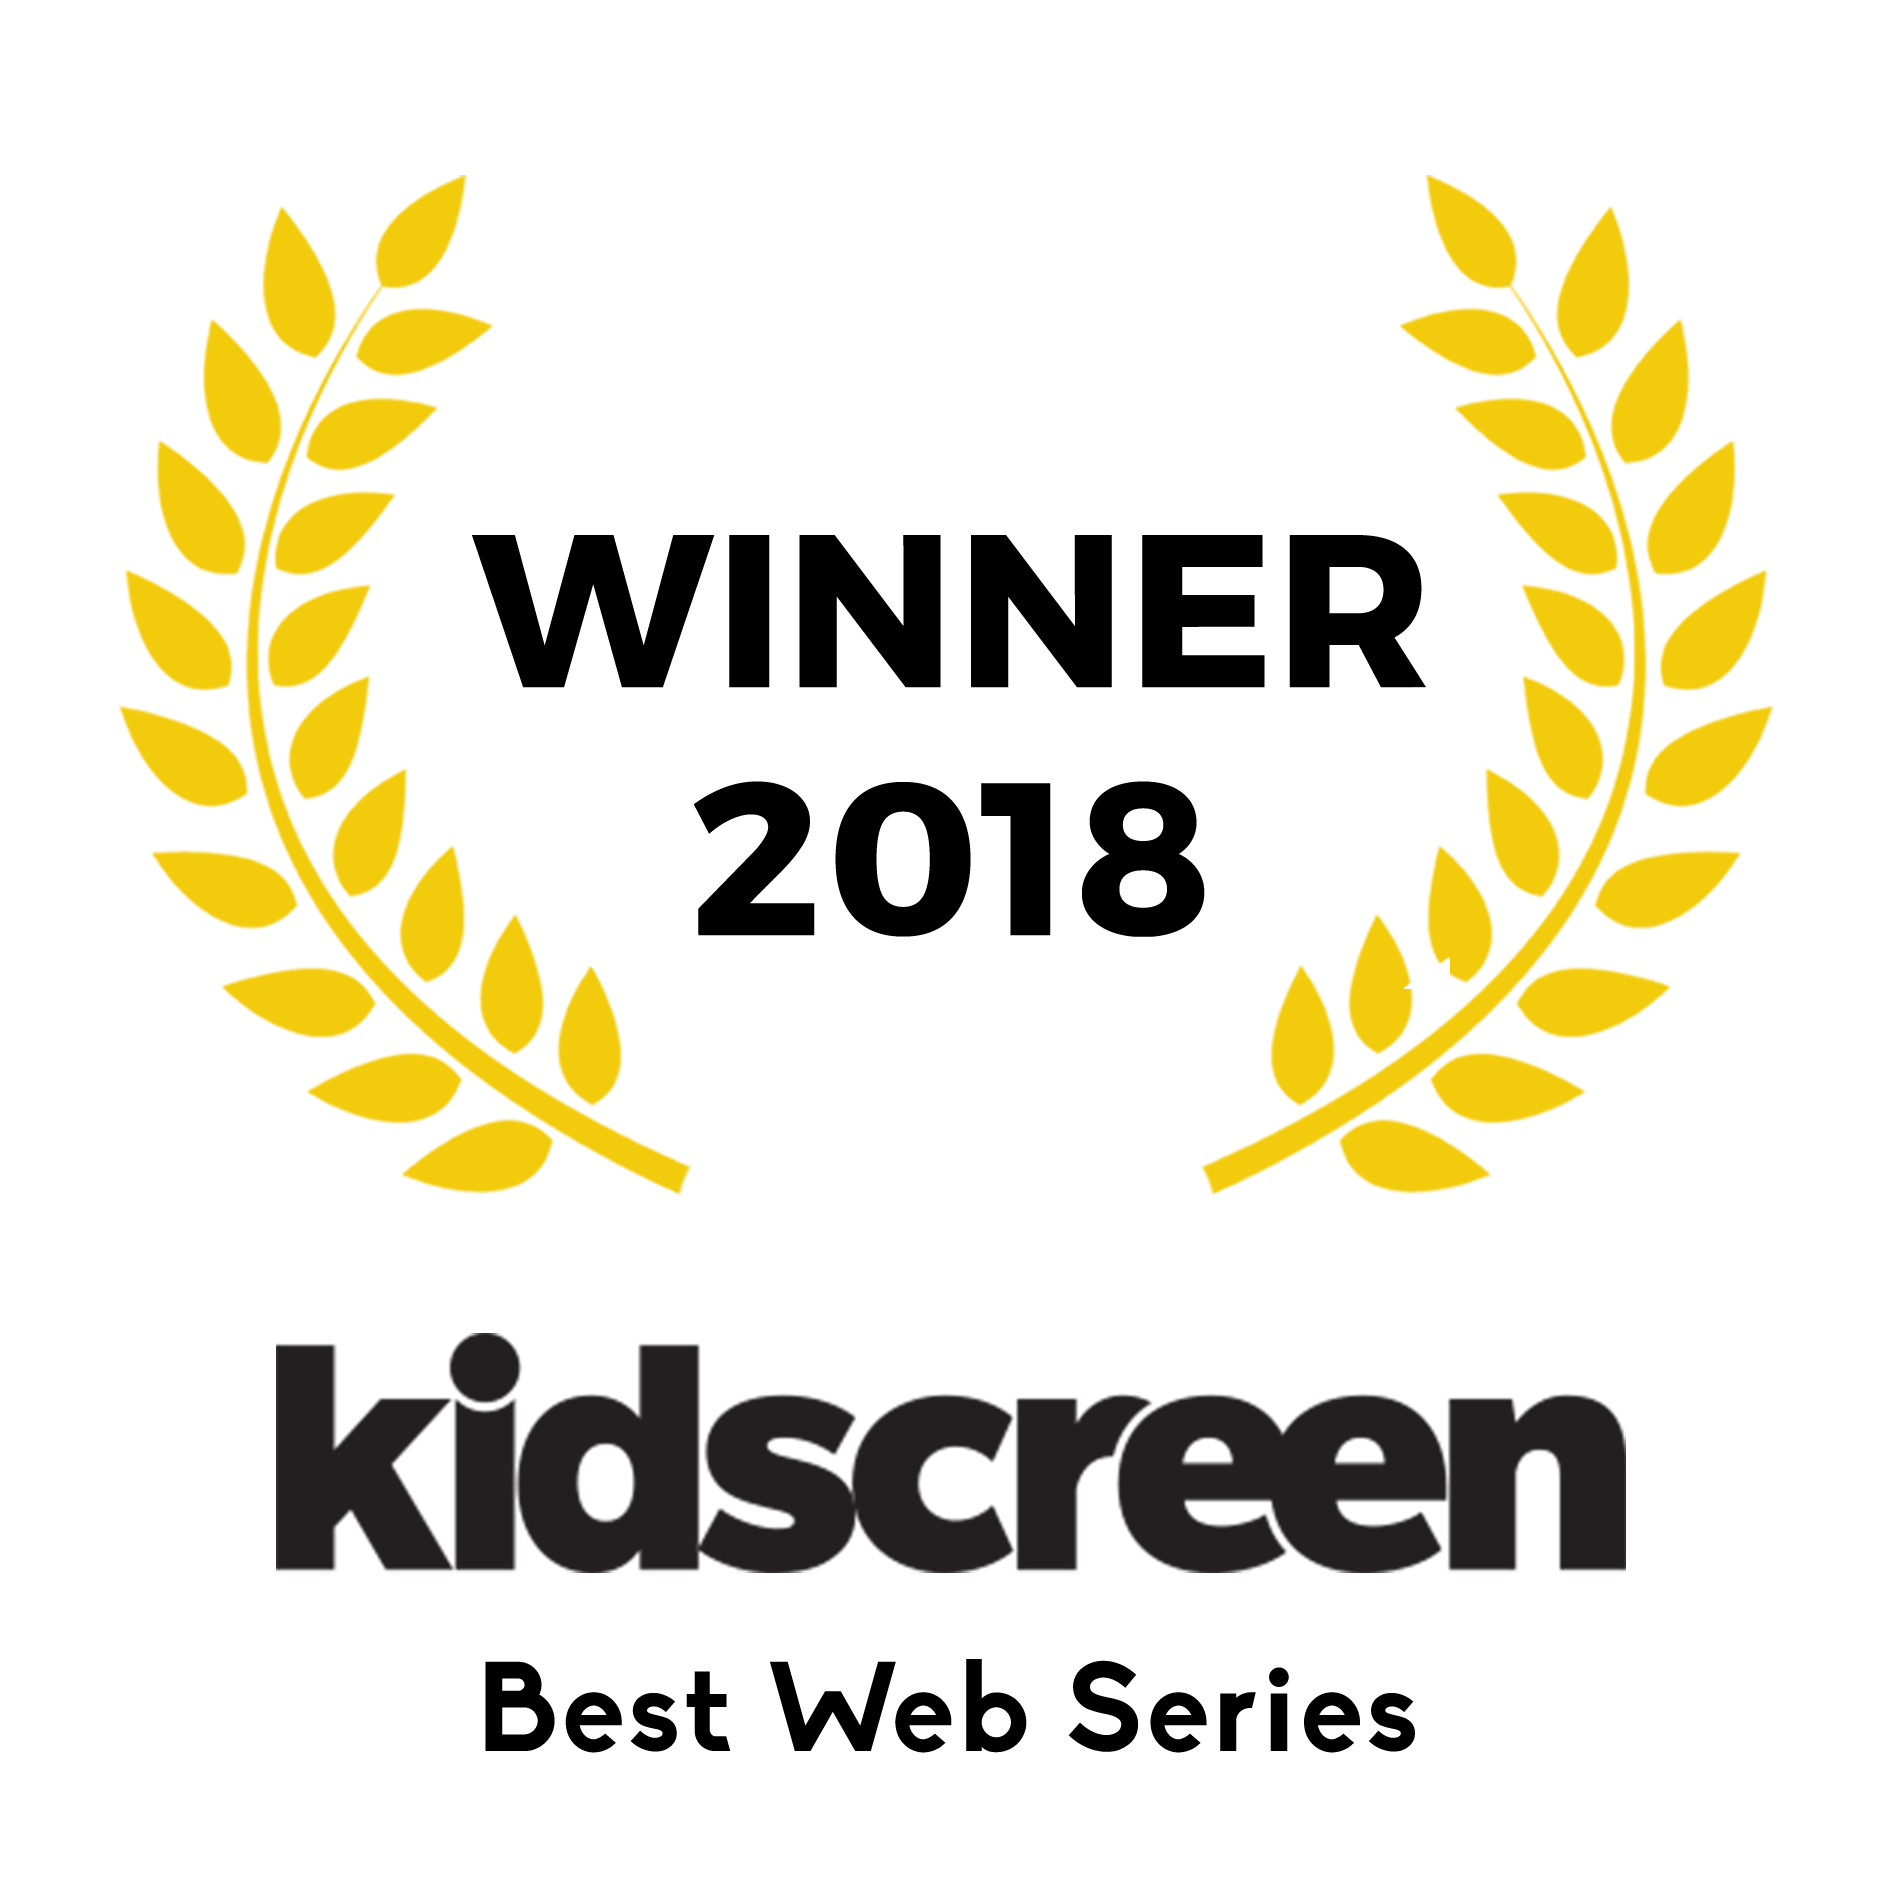 PaperGirls_kidscreen_winner_b.png